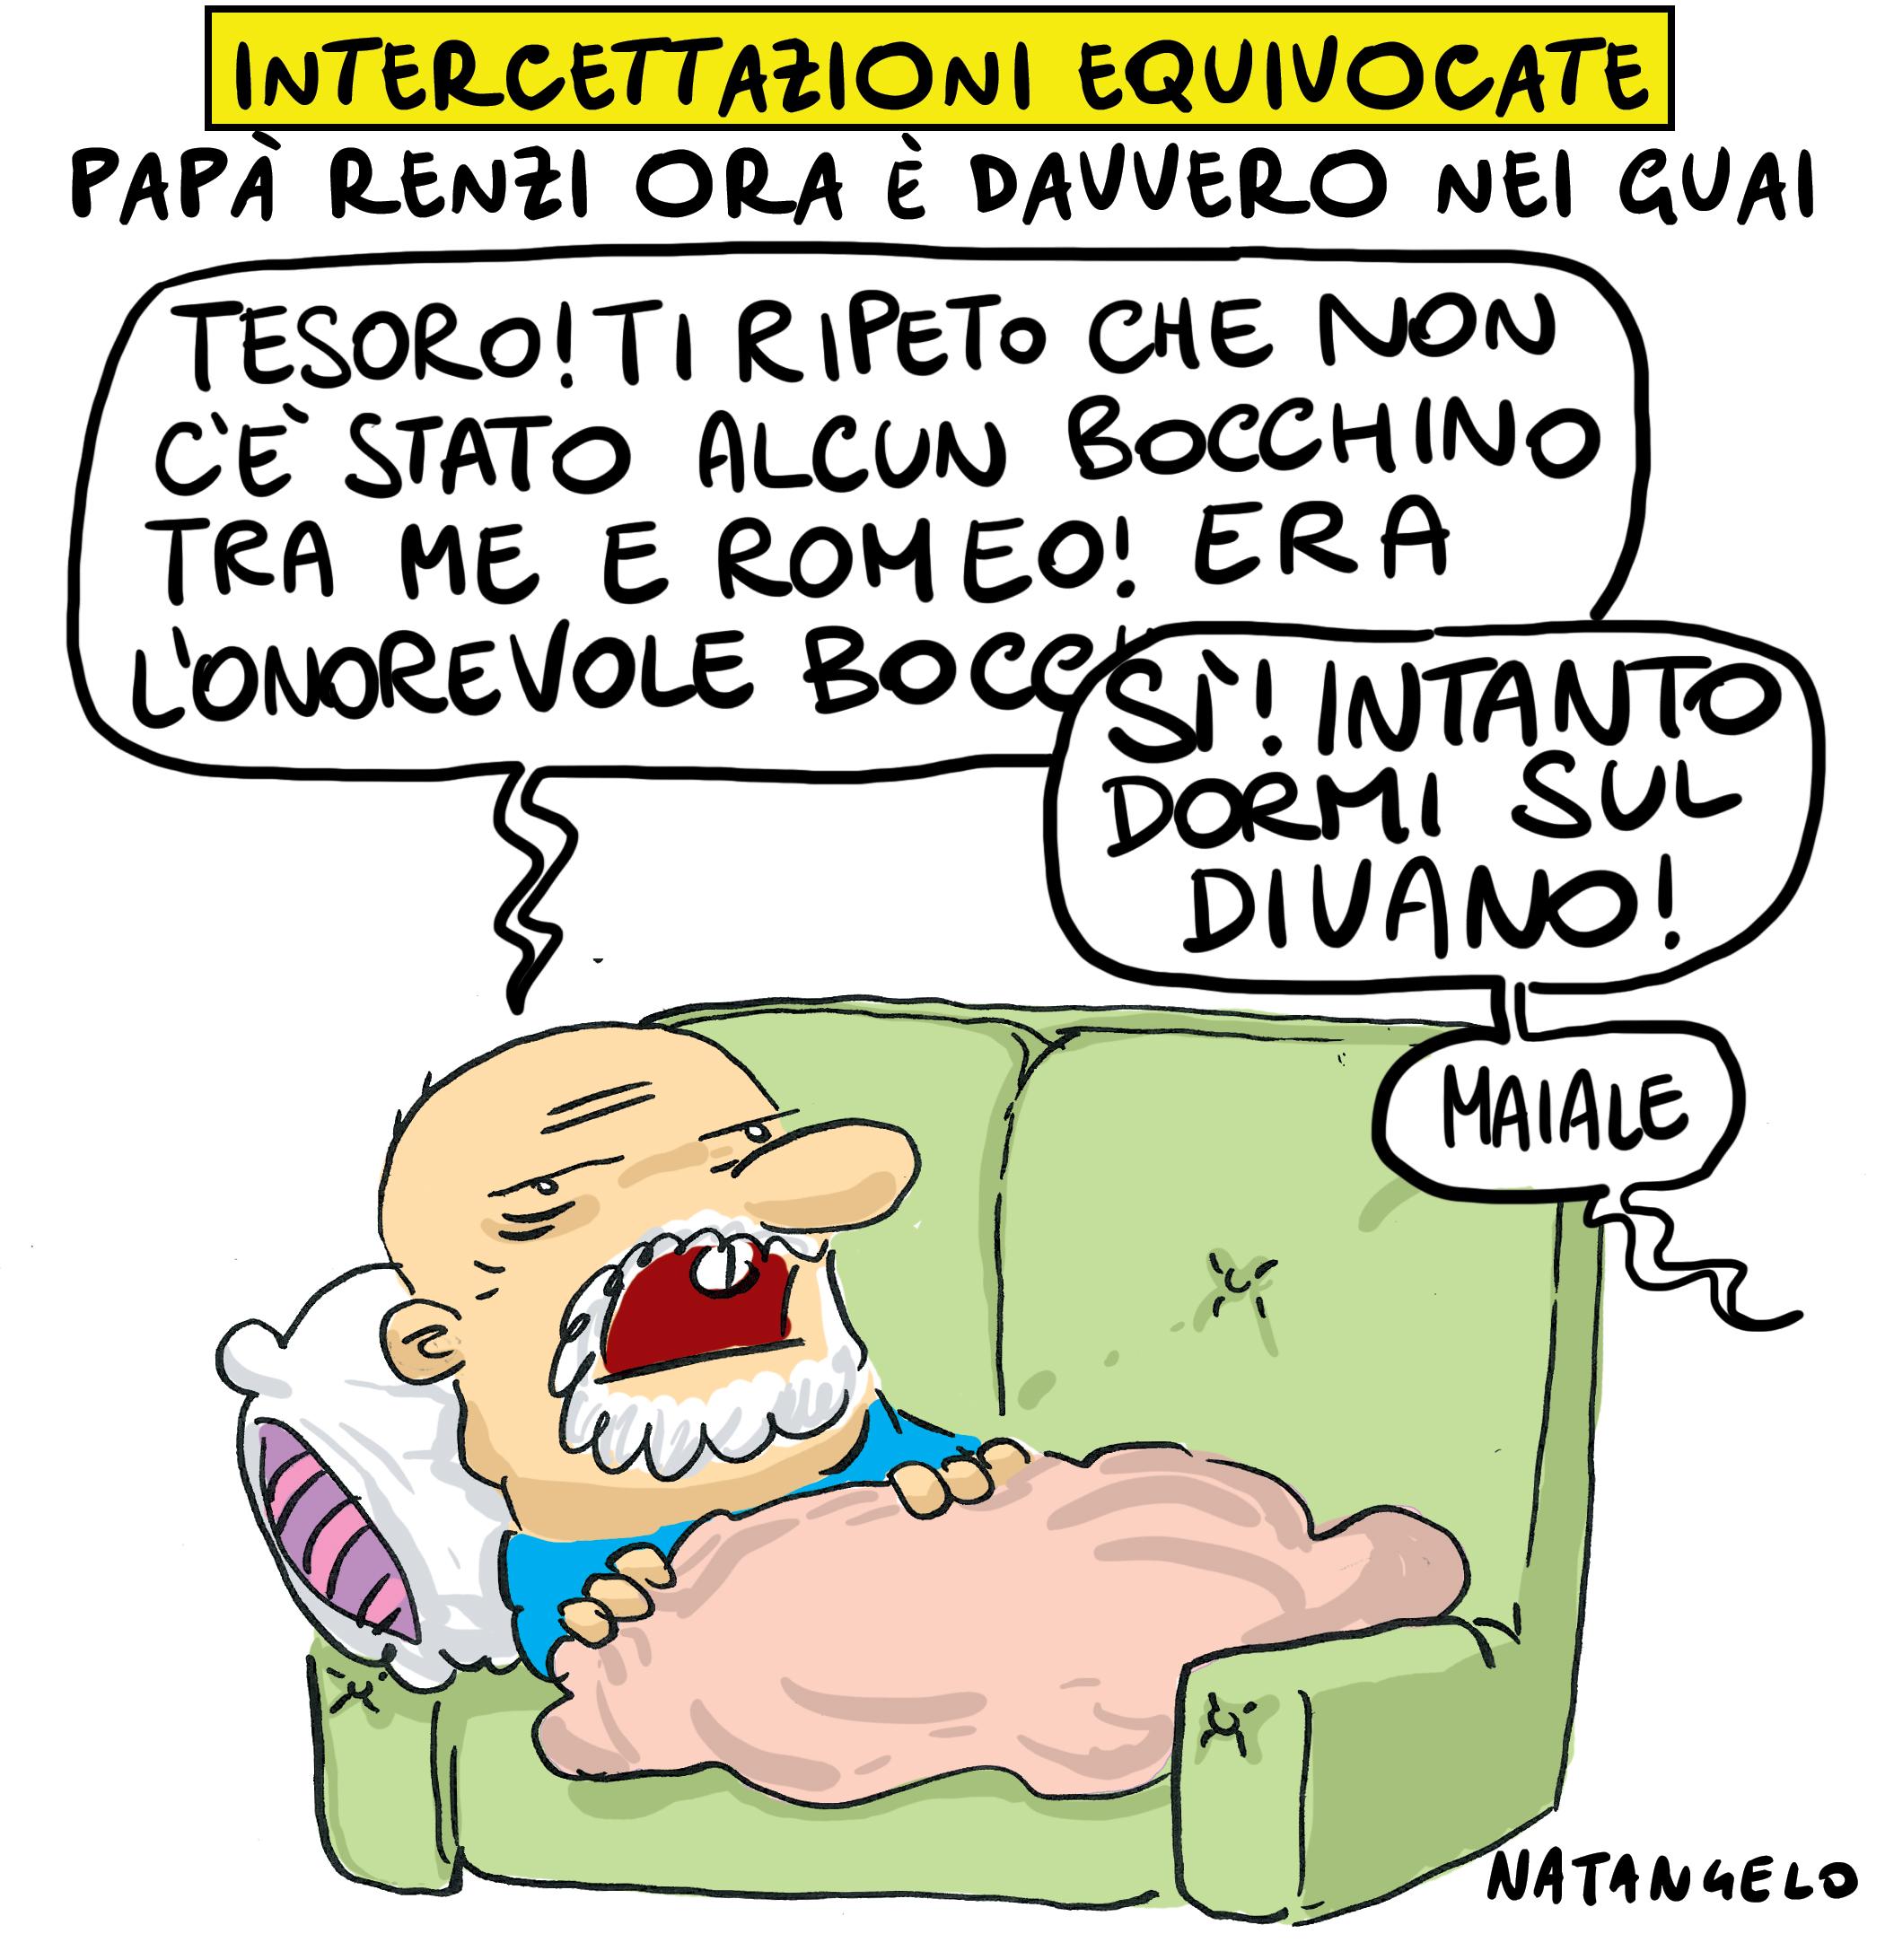 Adesso papà Renzi è DAVVERO nei guai